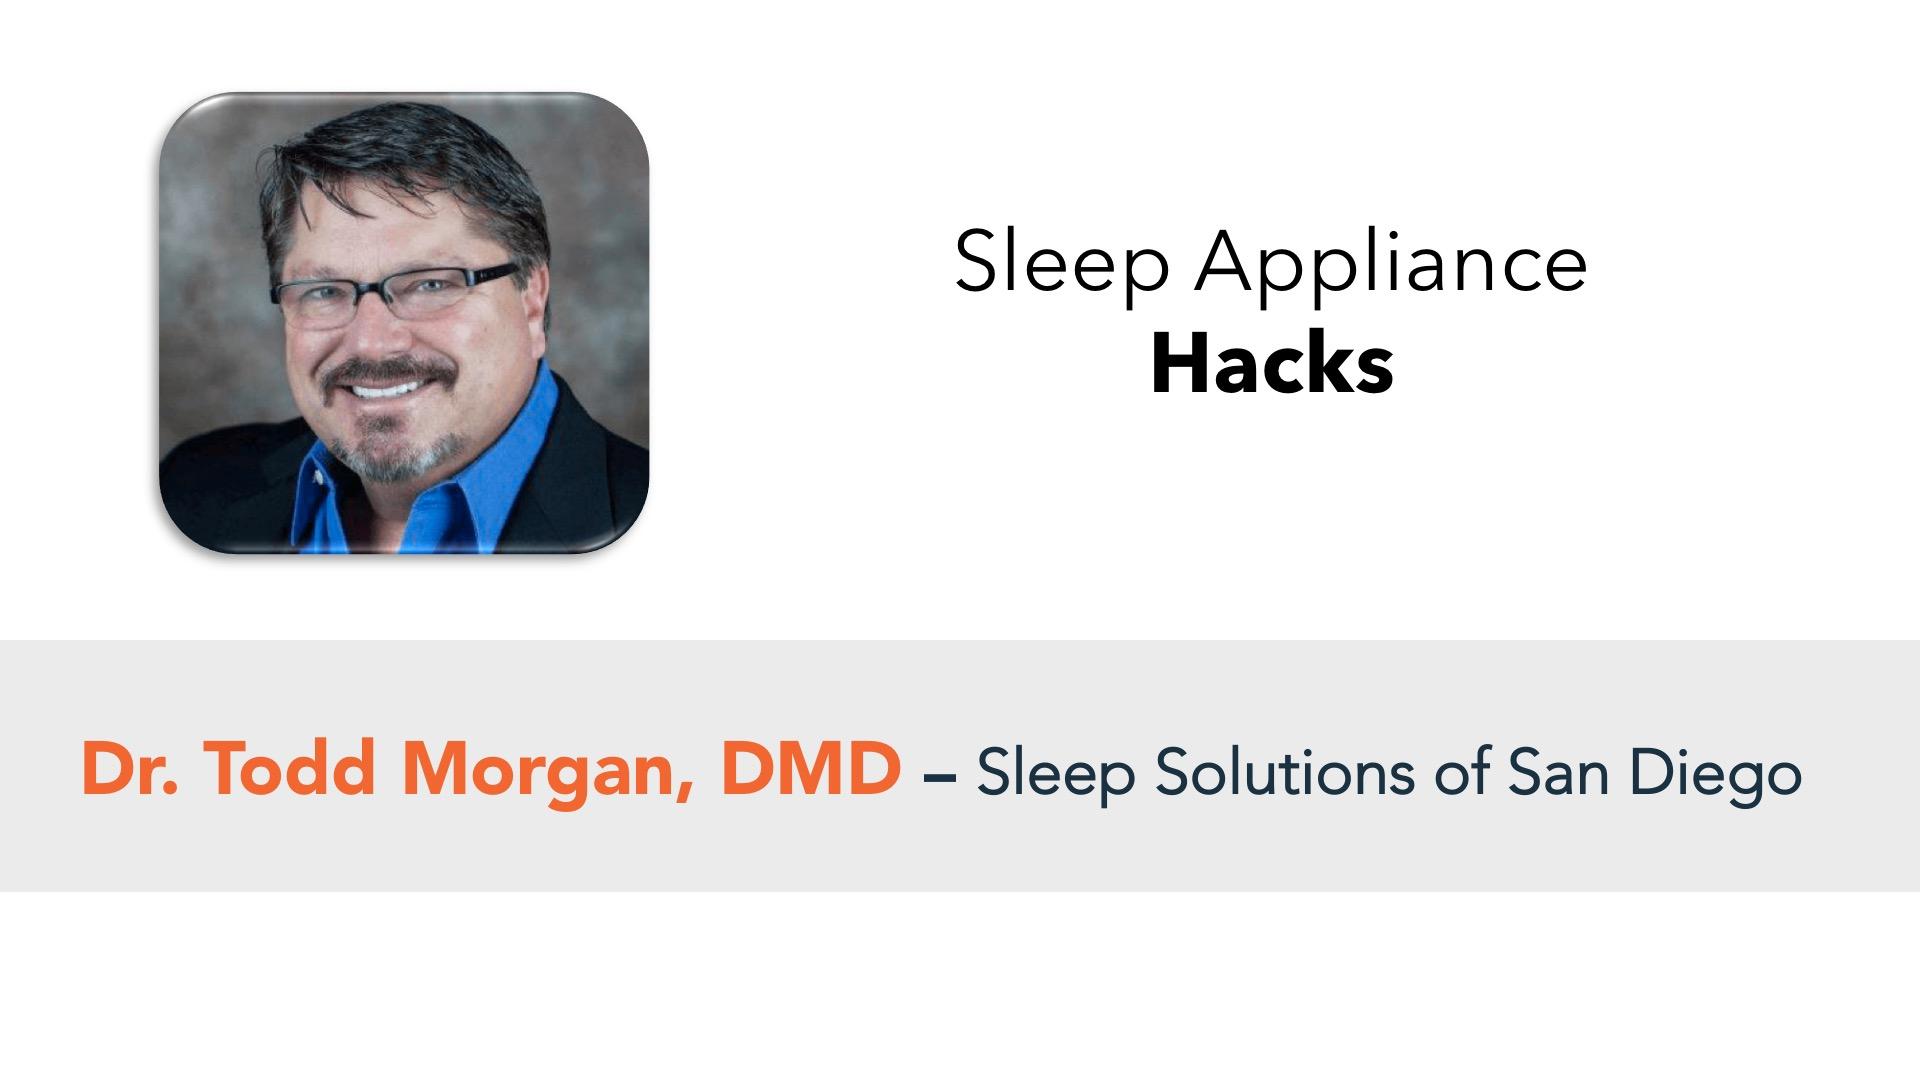 Morgan Sleep Appliance Hacks title.jpg